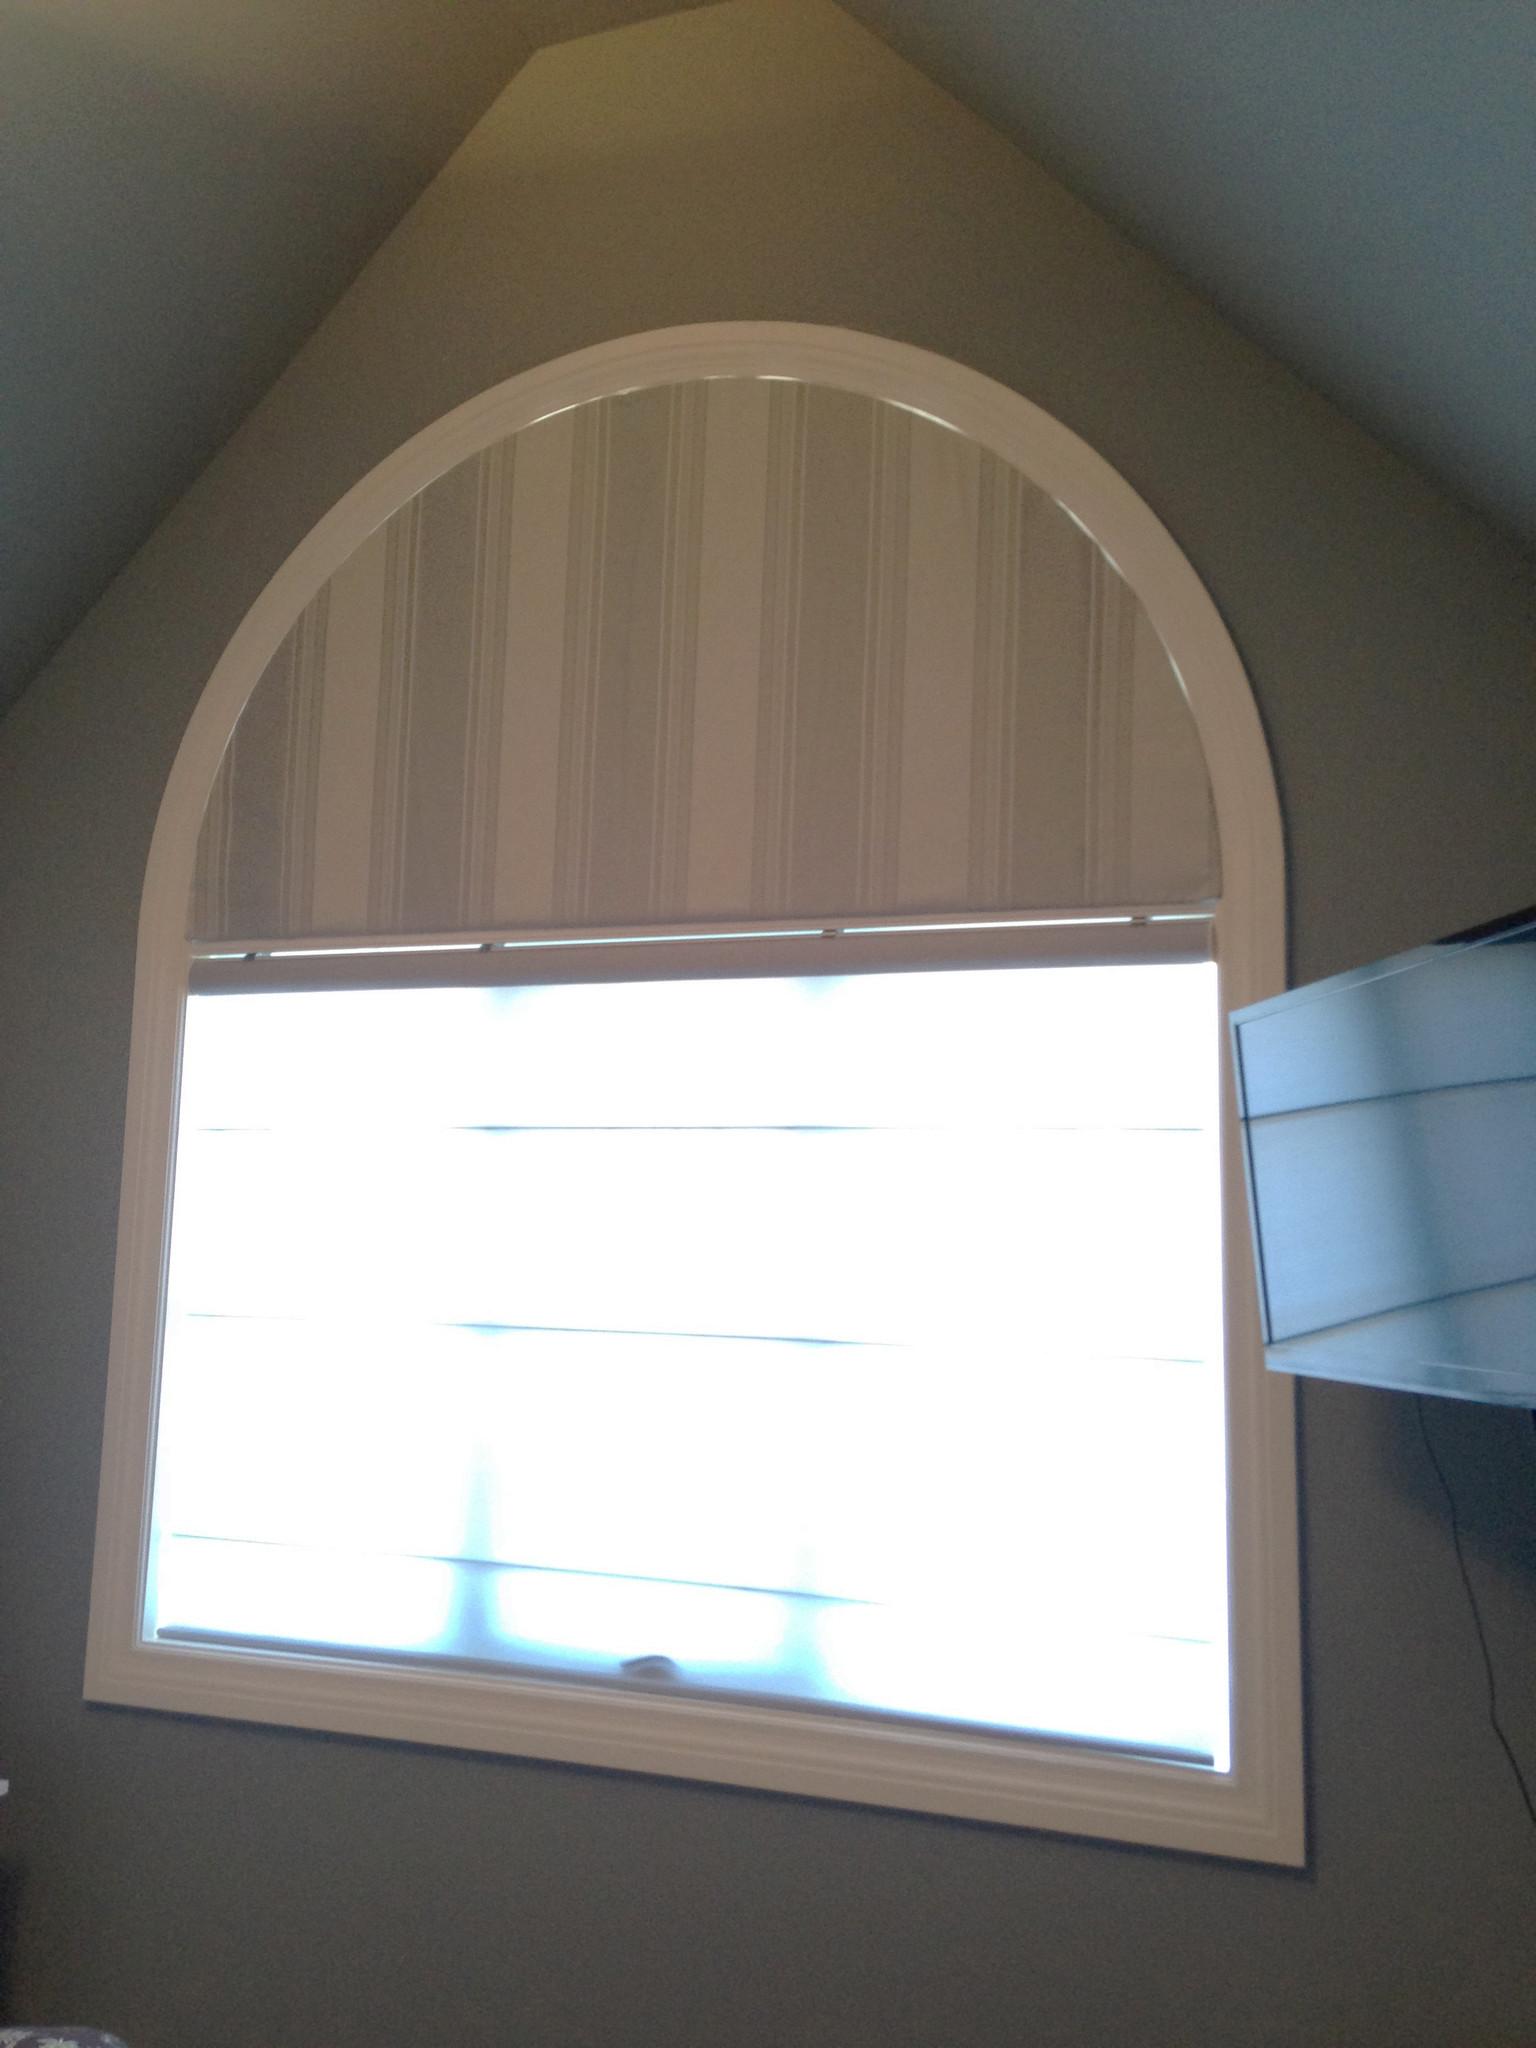 Trendy Drapery - DM Arch Window Valance